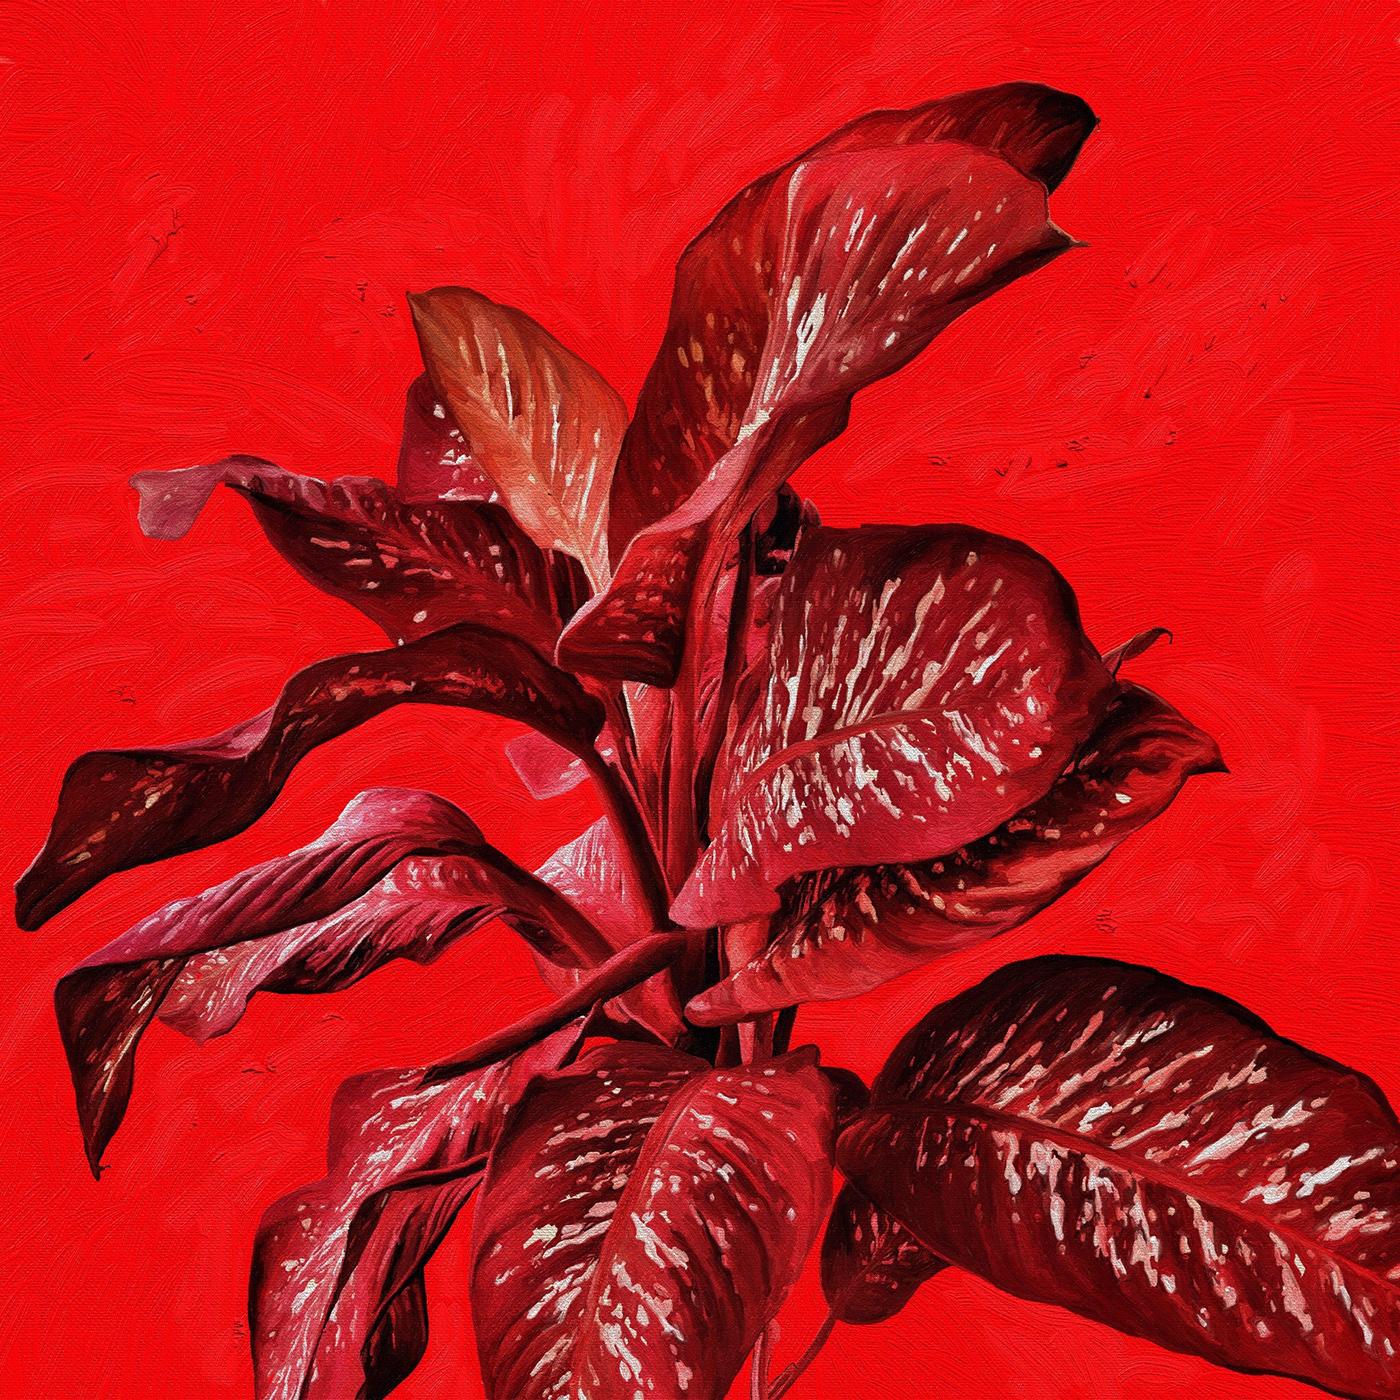 Brazilian painting contemporary art Contemporary painting digital painting Flora pintura vida nua